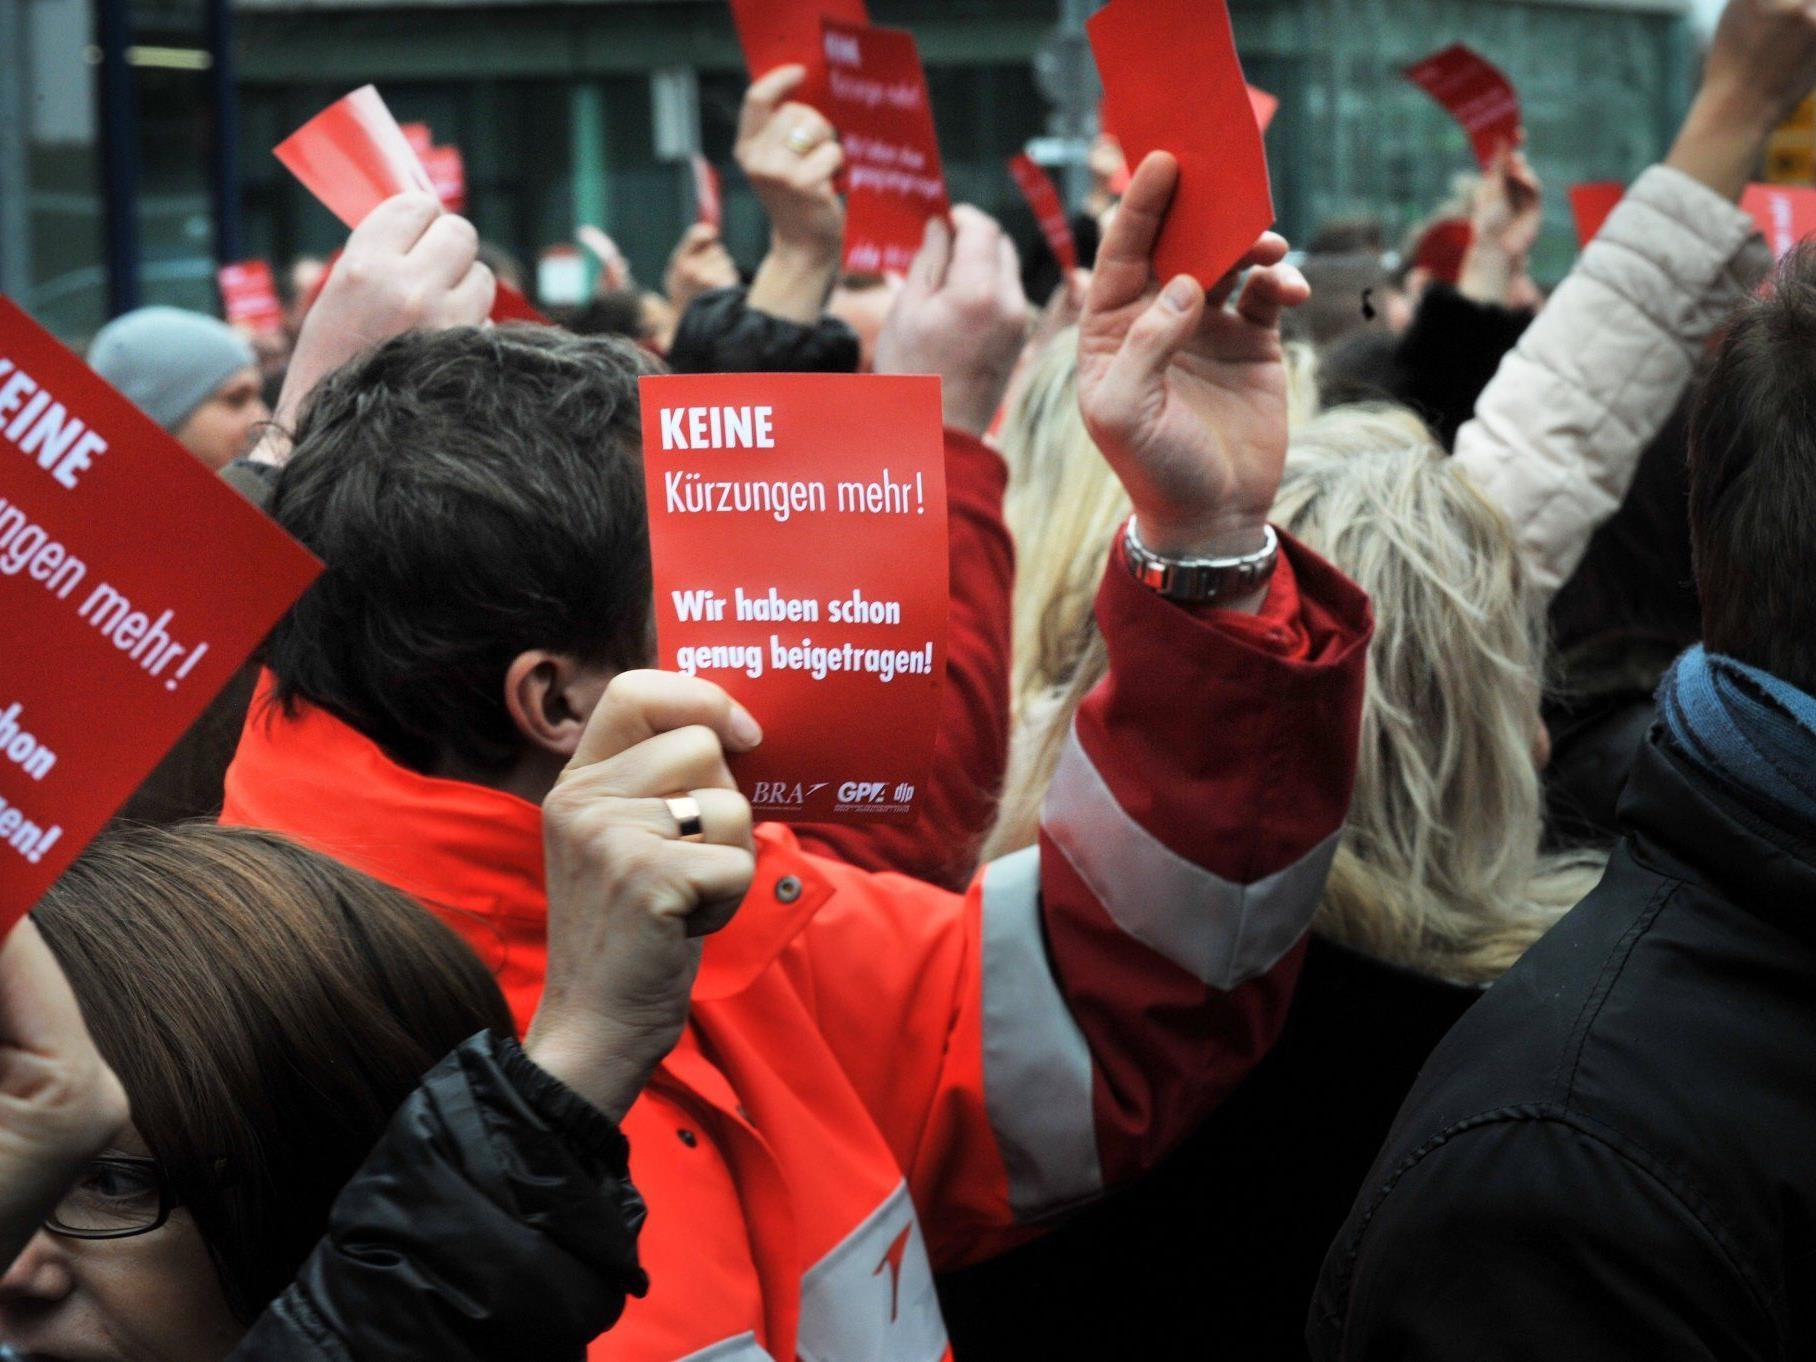 Das Bodenpersonal protestiert